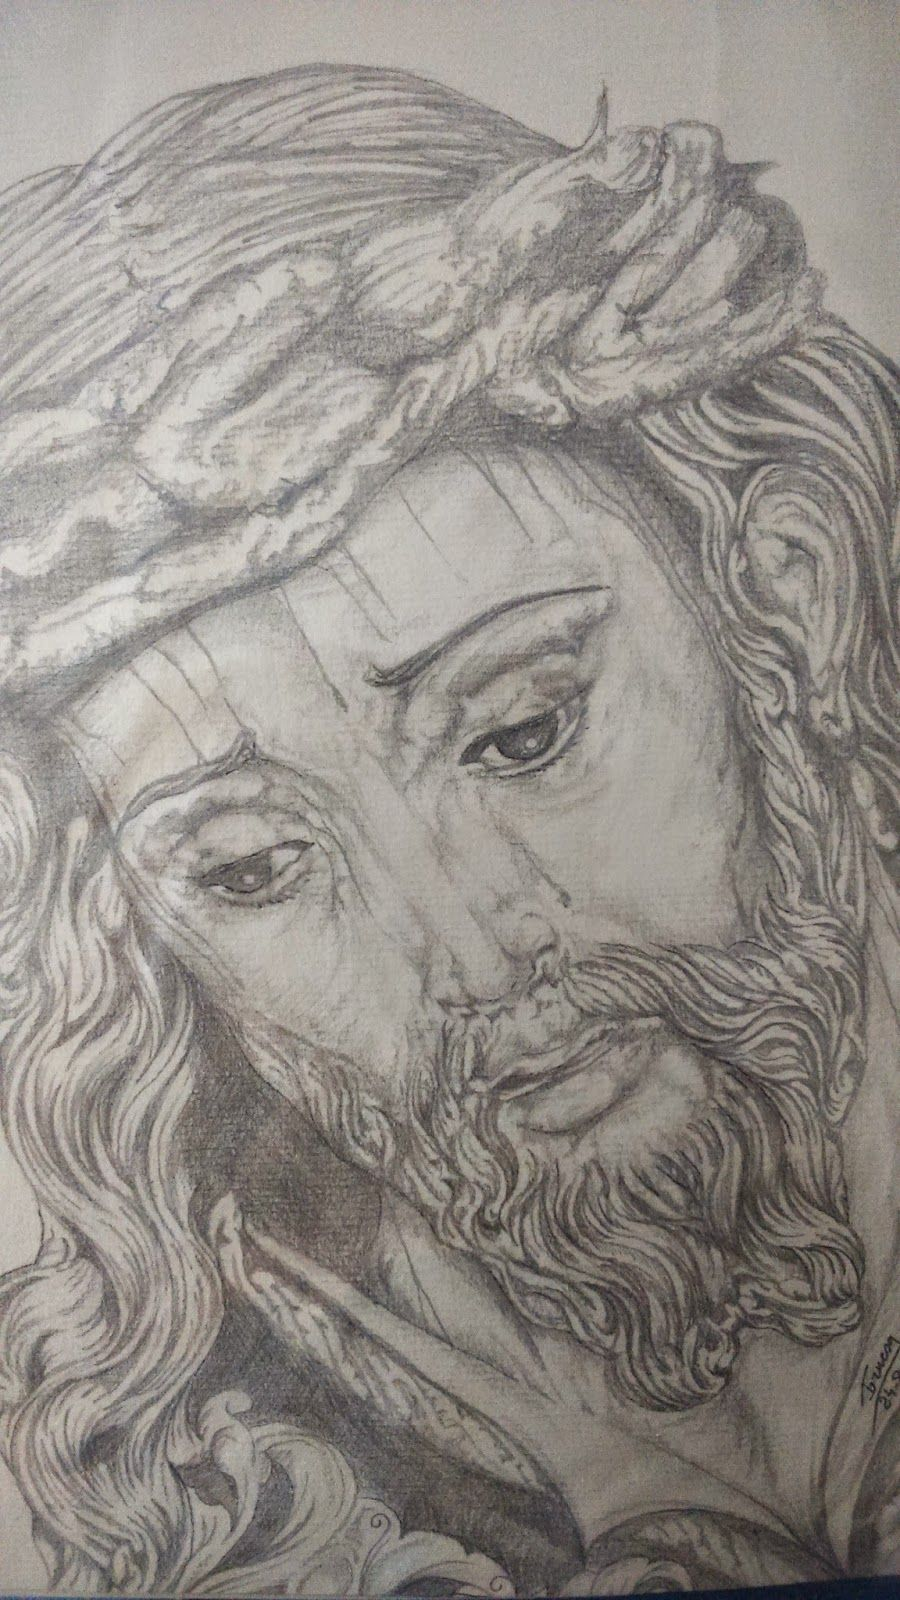 Dibujos A Lapiz Obra Religiosa Art Art Sketches Sketches